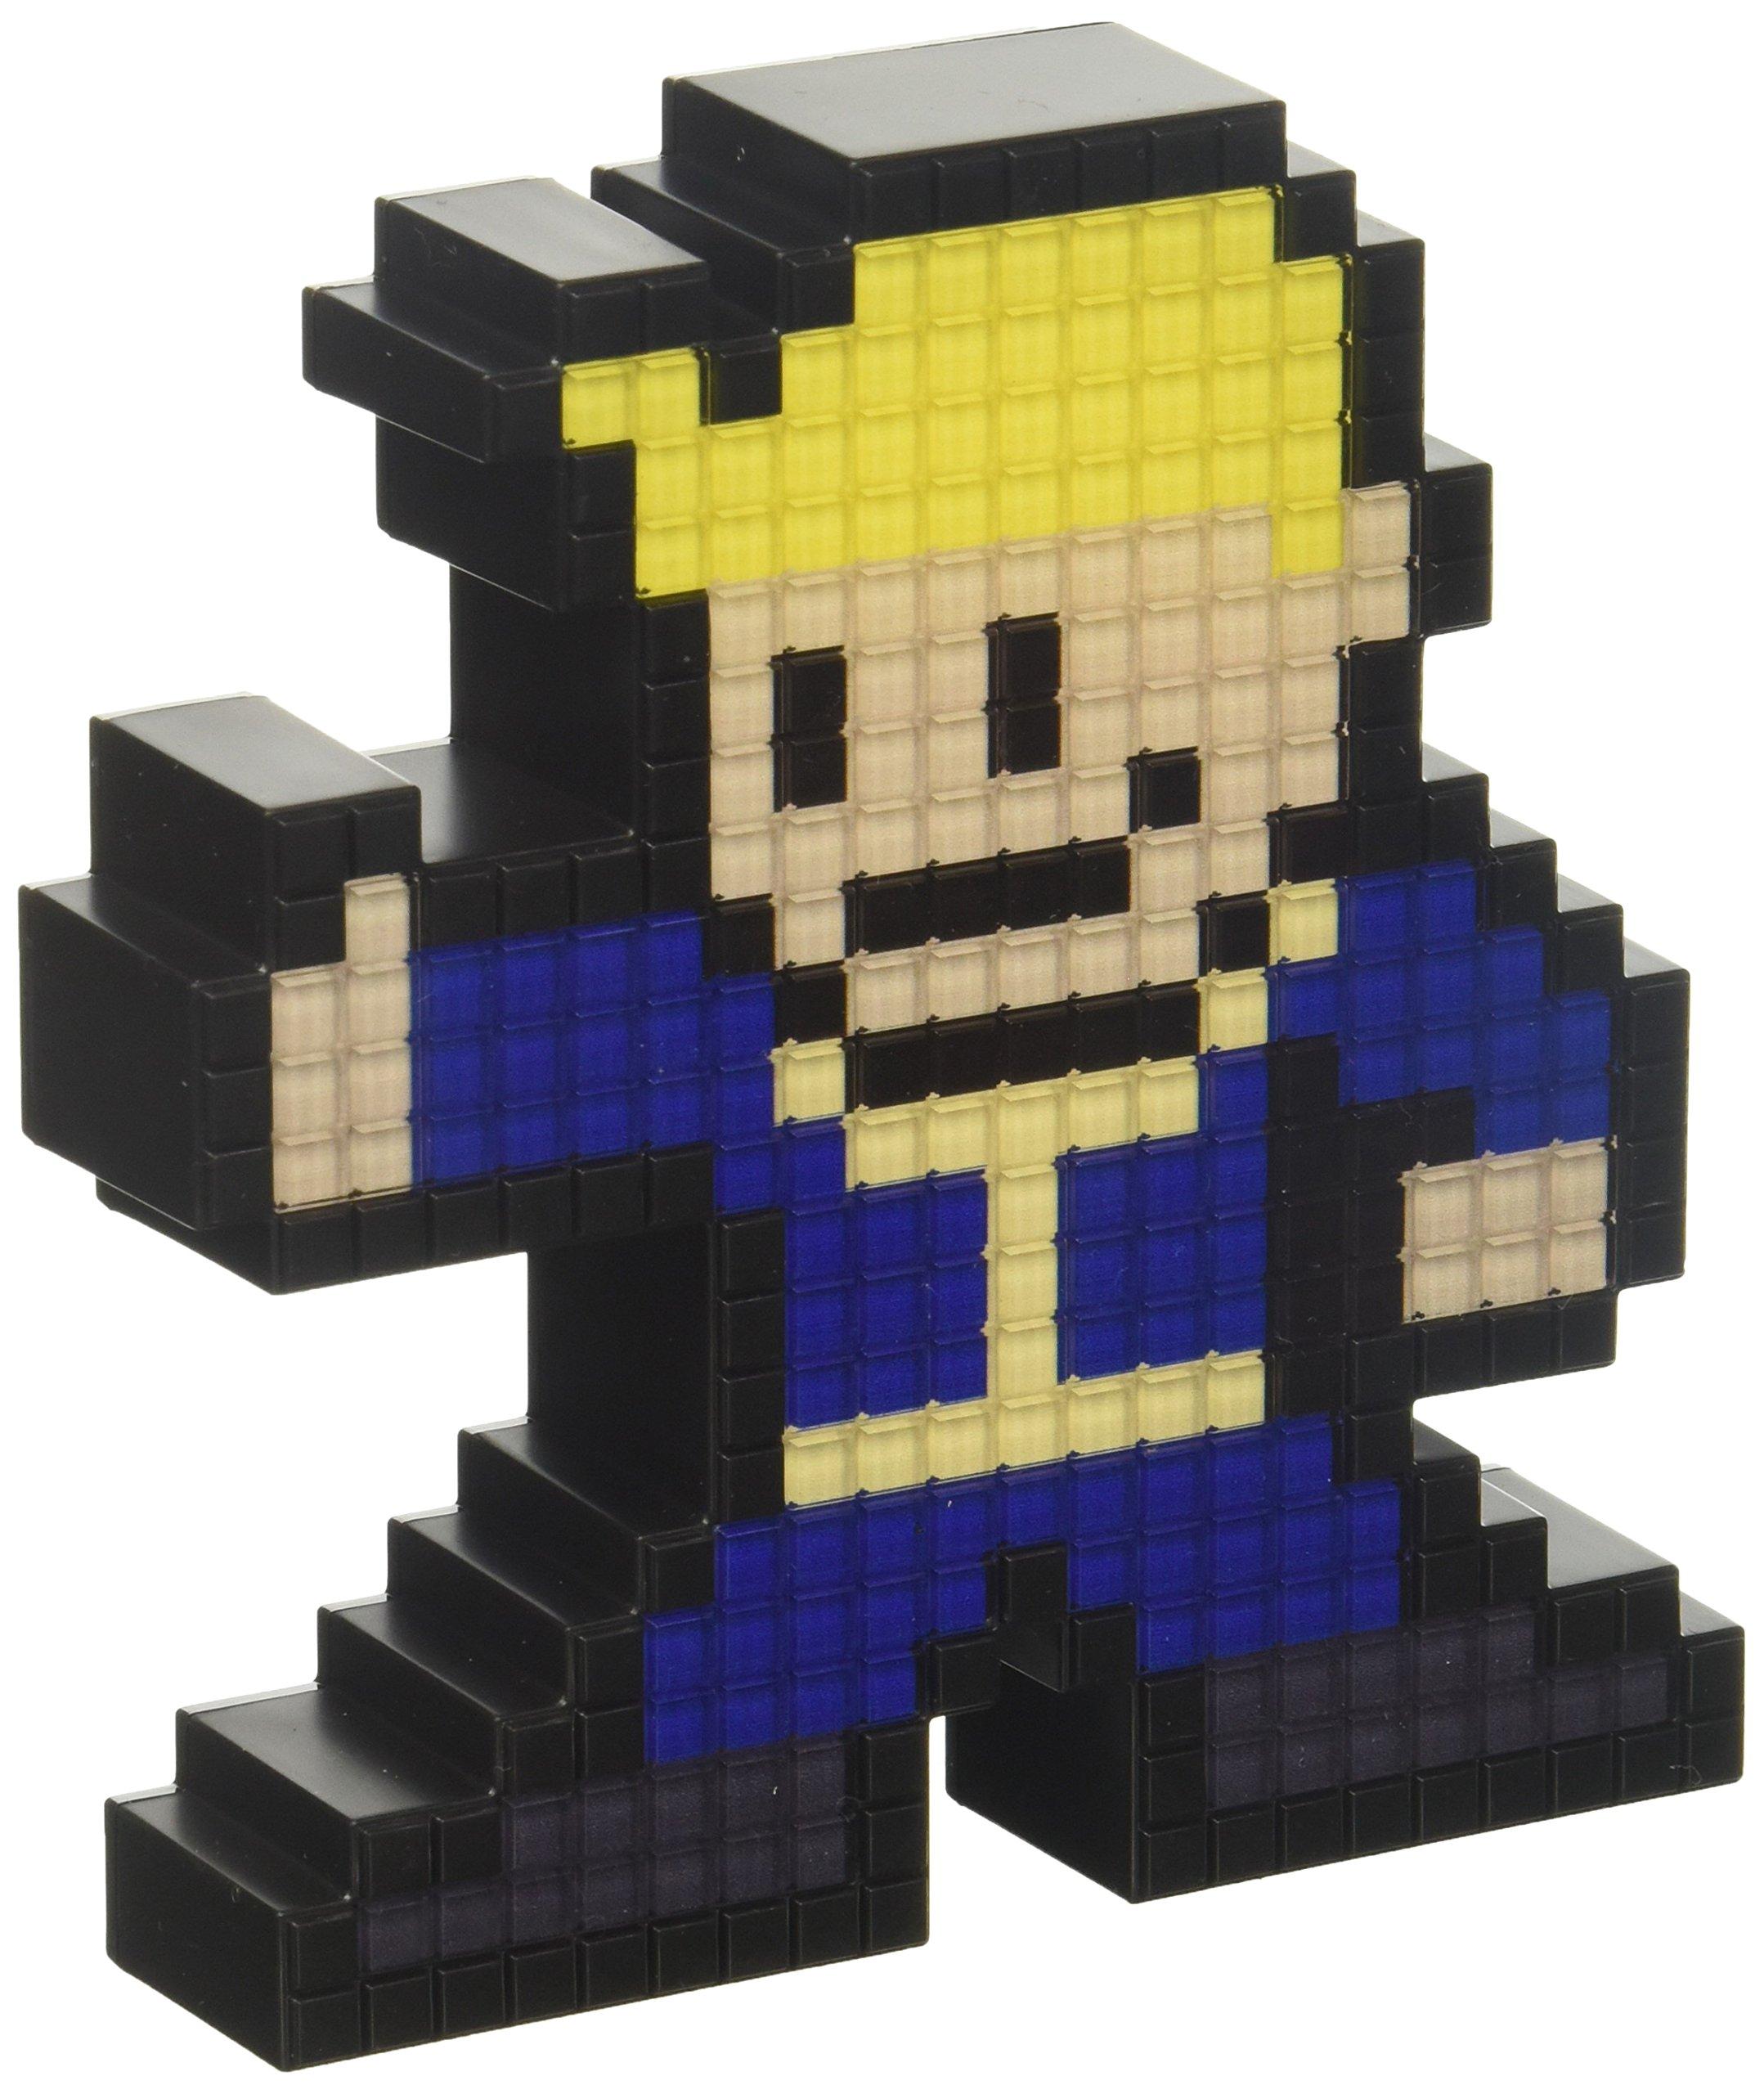 PDP Pixel Pals Fallout 4 Vault Boy Collectible Lighted Figure, 878-021-NA-VLT-NB